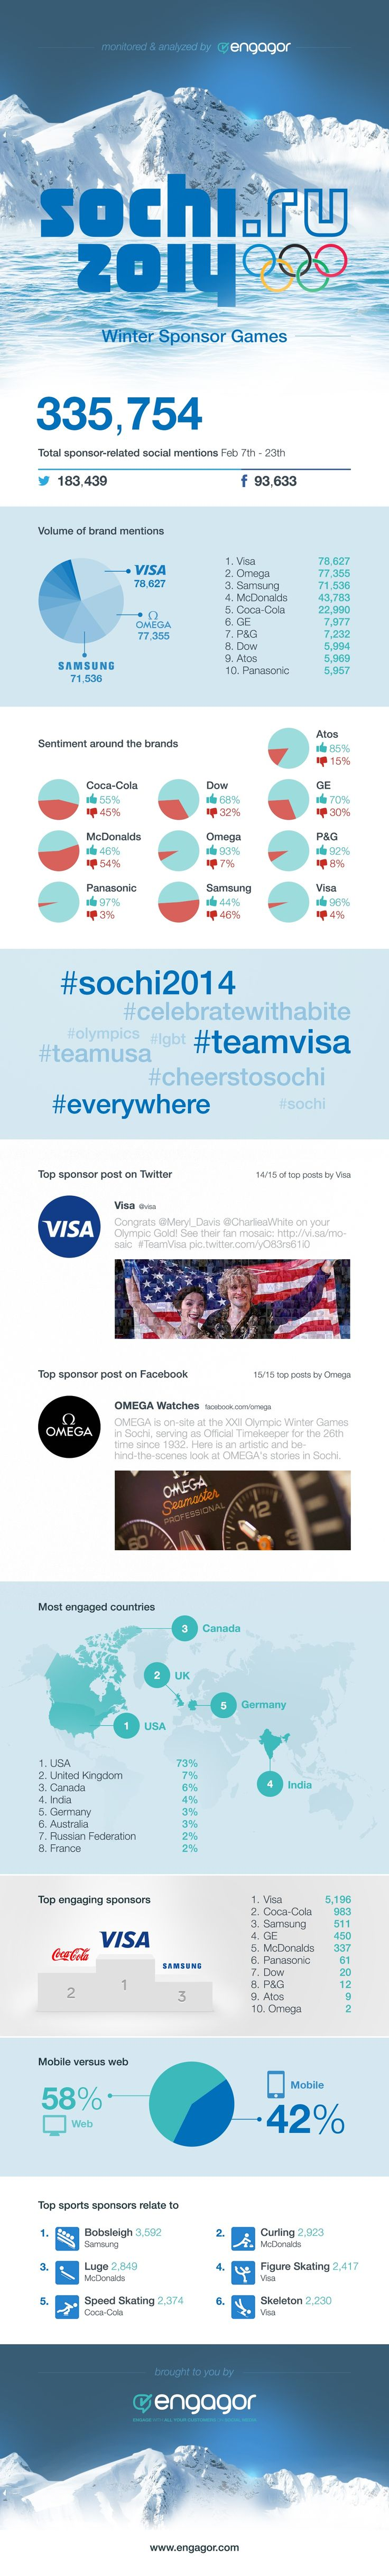 Visa, OMEGA, Samsung Lead #Sochi #Olympics Brand Social Mentions [INFOGRAPHIC]